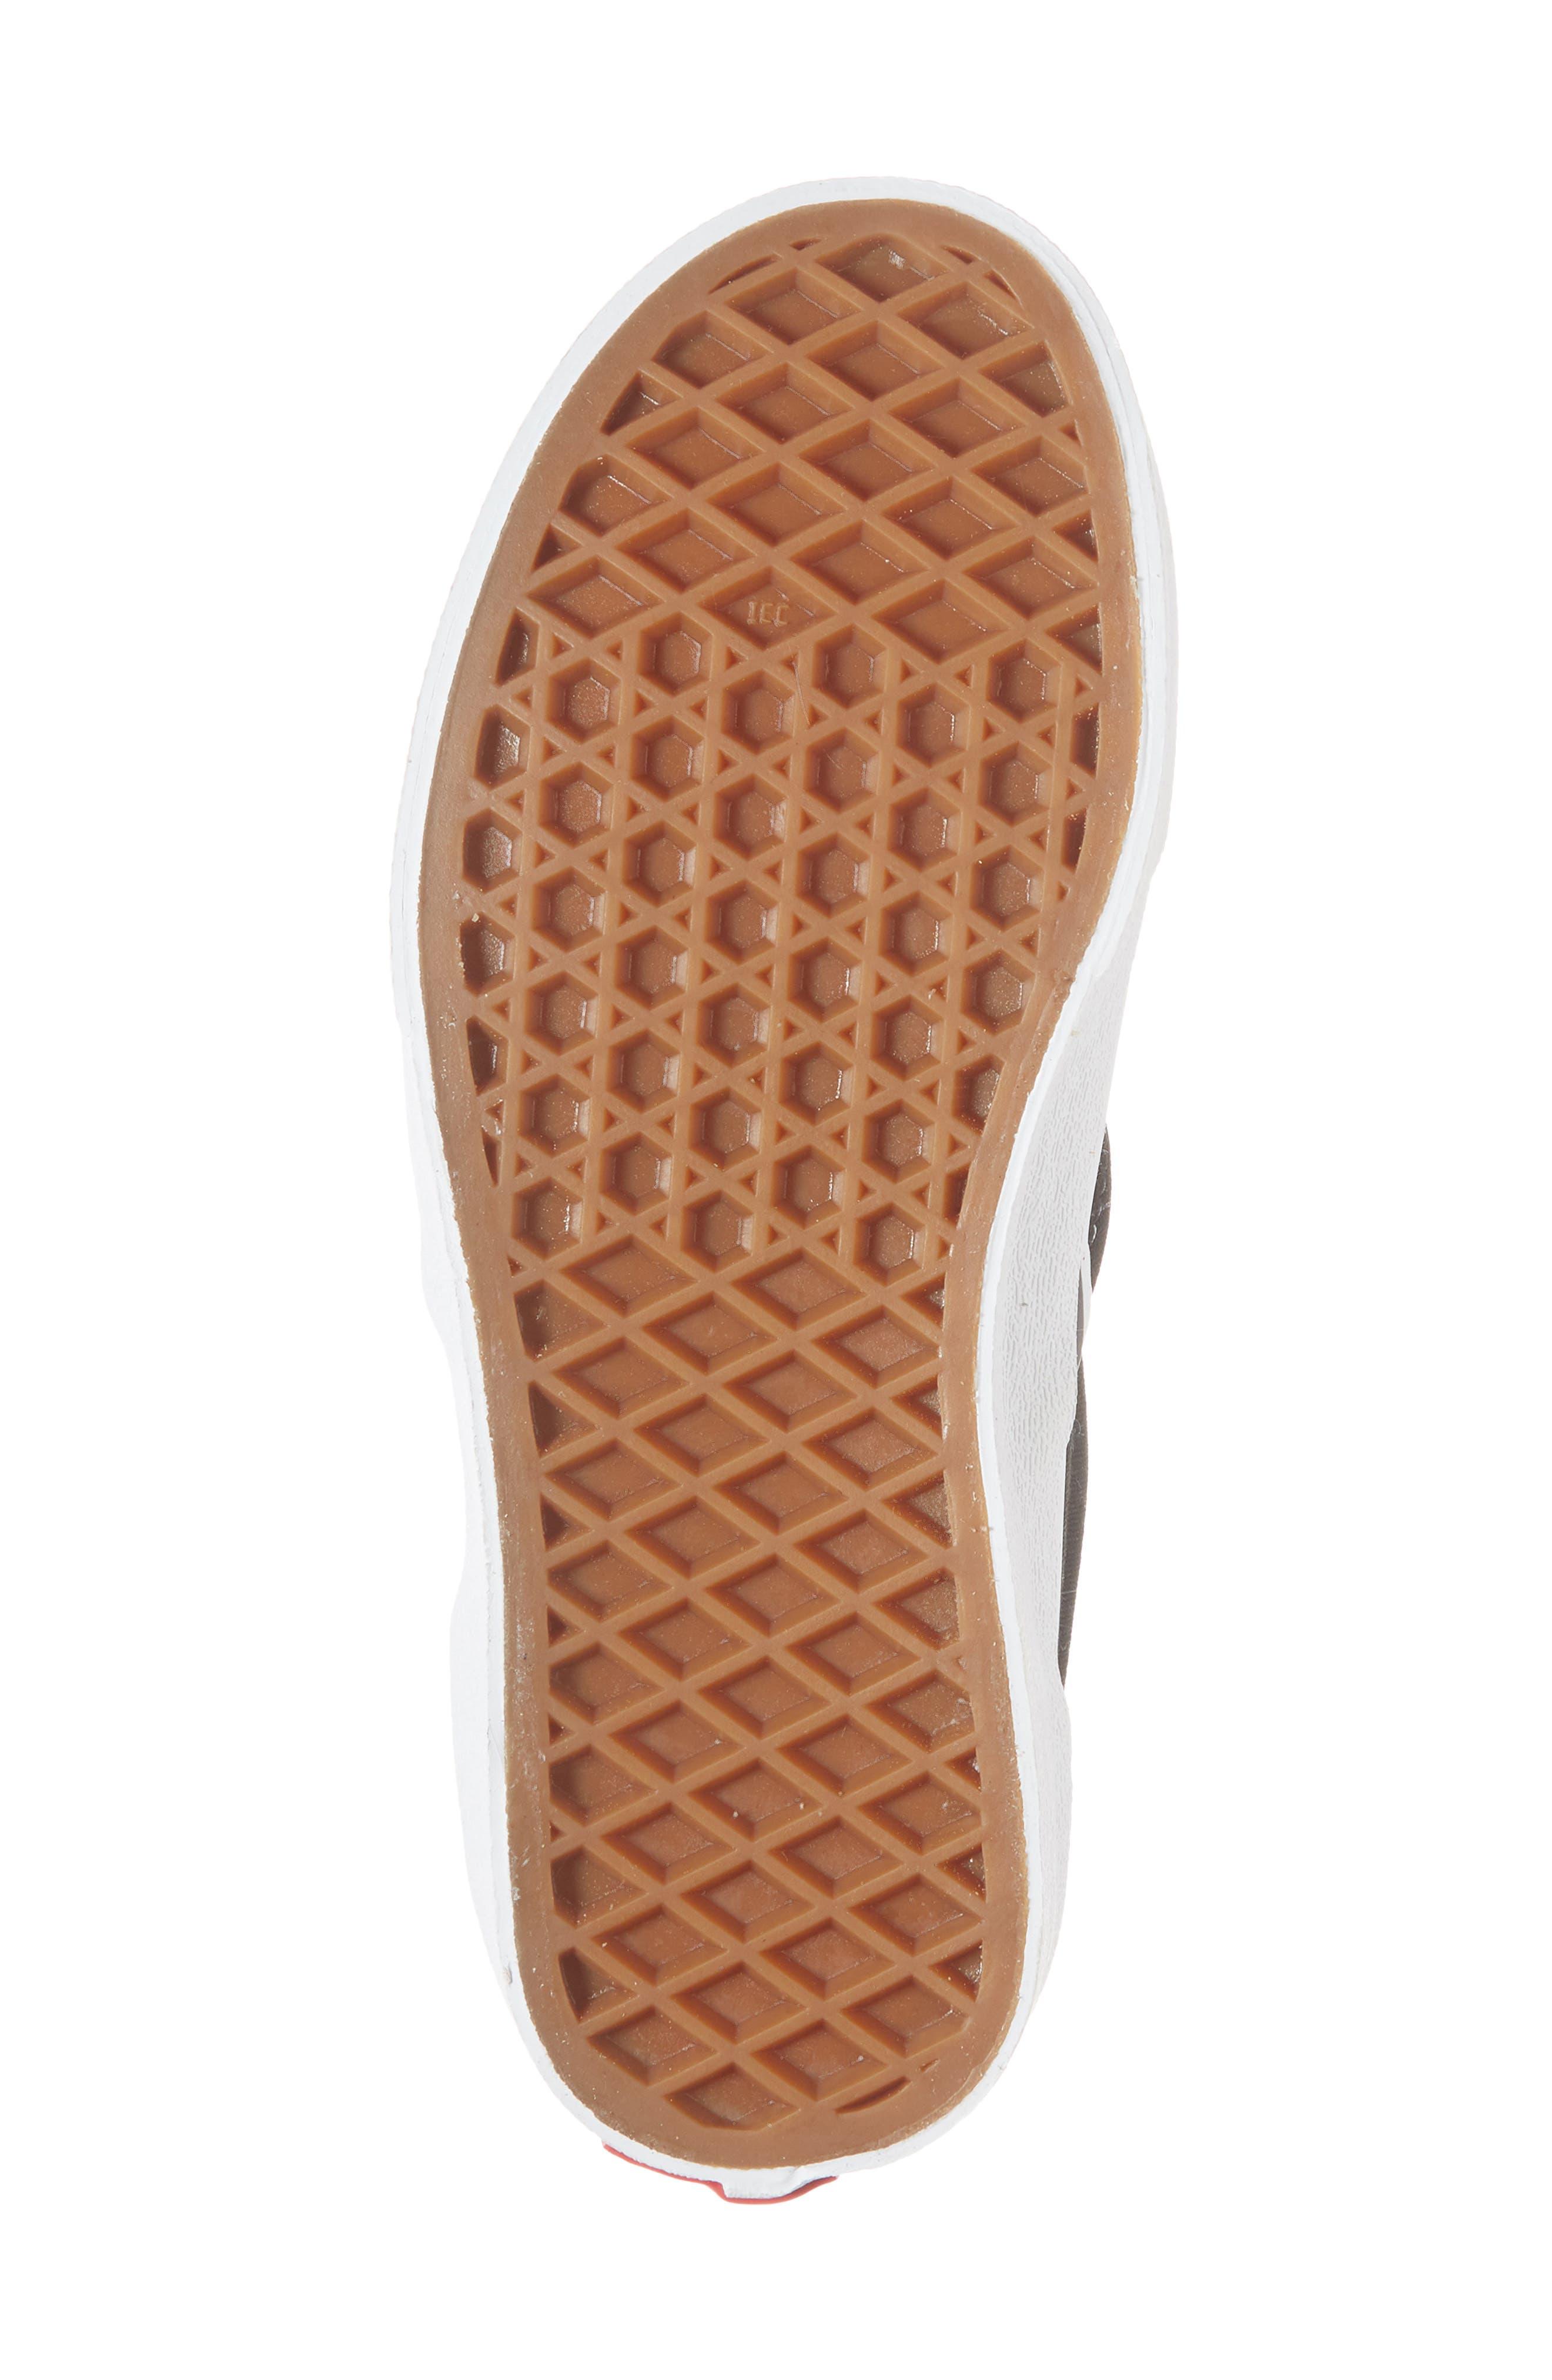 Party Check Slip-On Sneaker,                             Alternate thumbnail 6, color,                             001